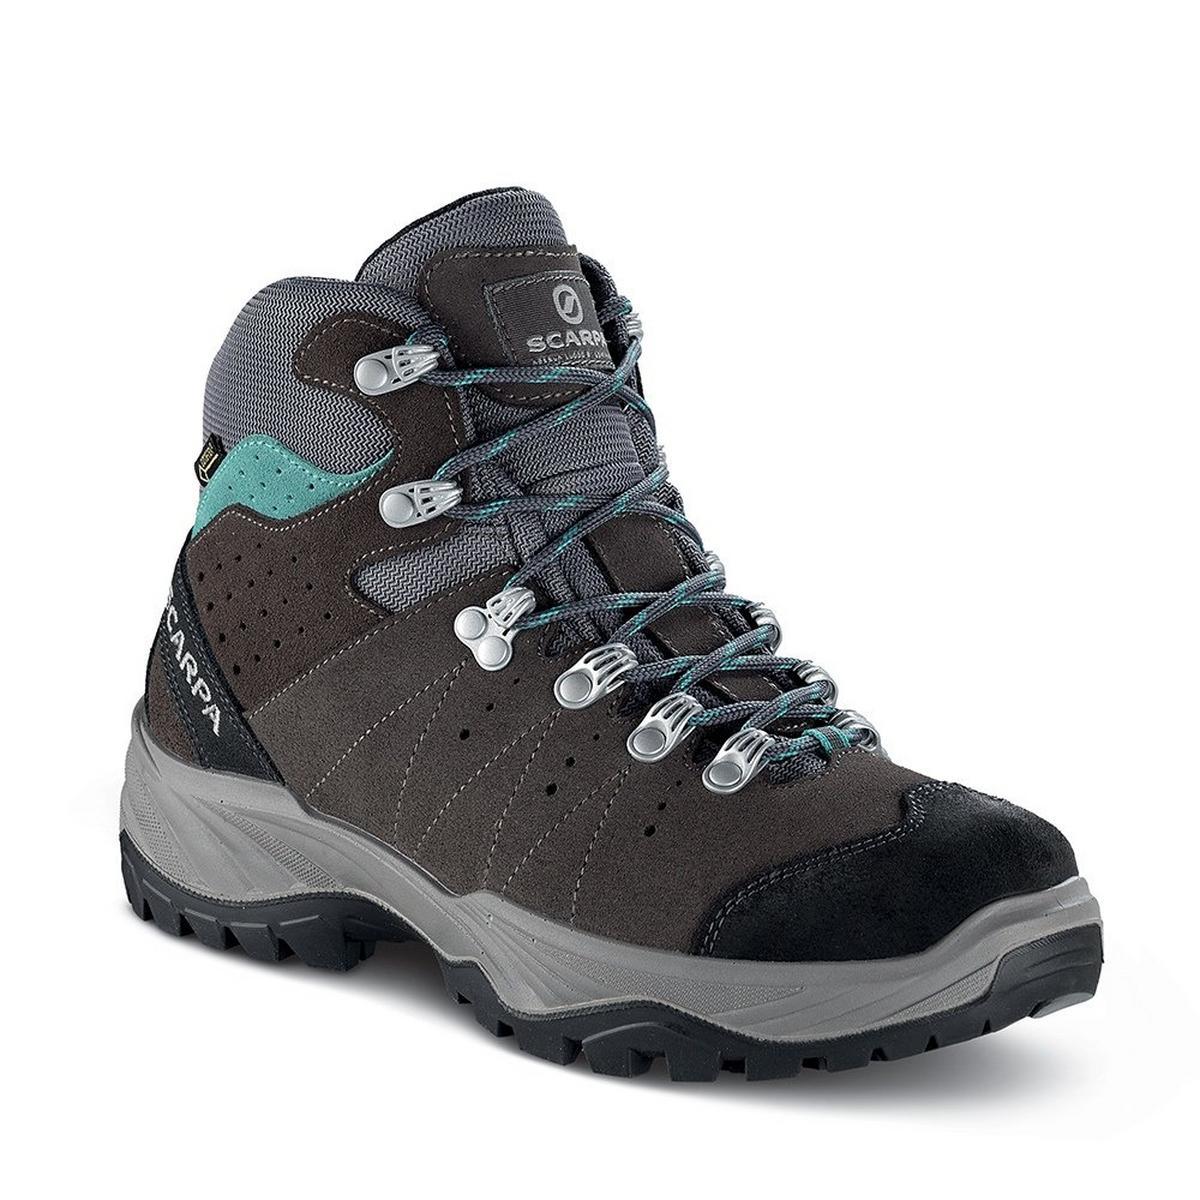 Scarpa Women's Mistral Gore-Tex Walking Boot